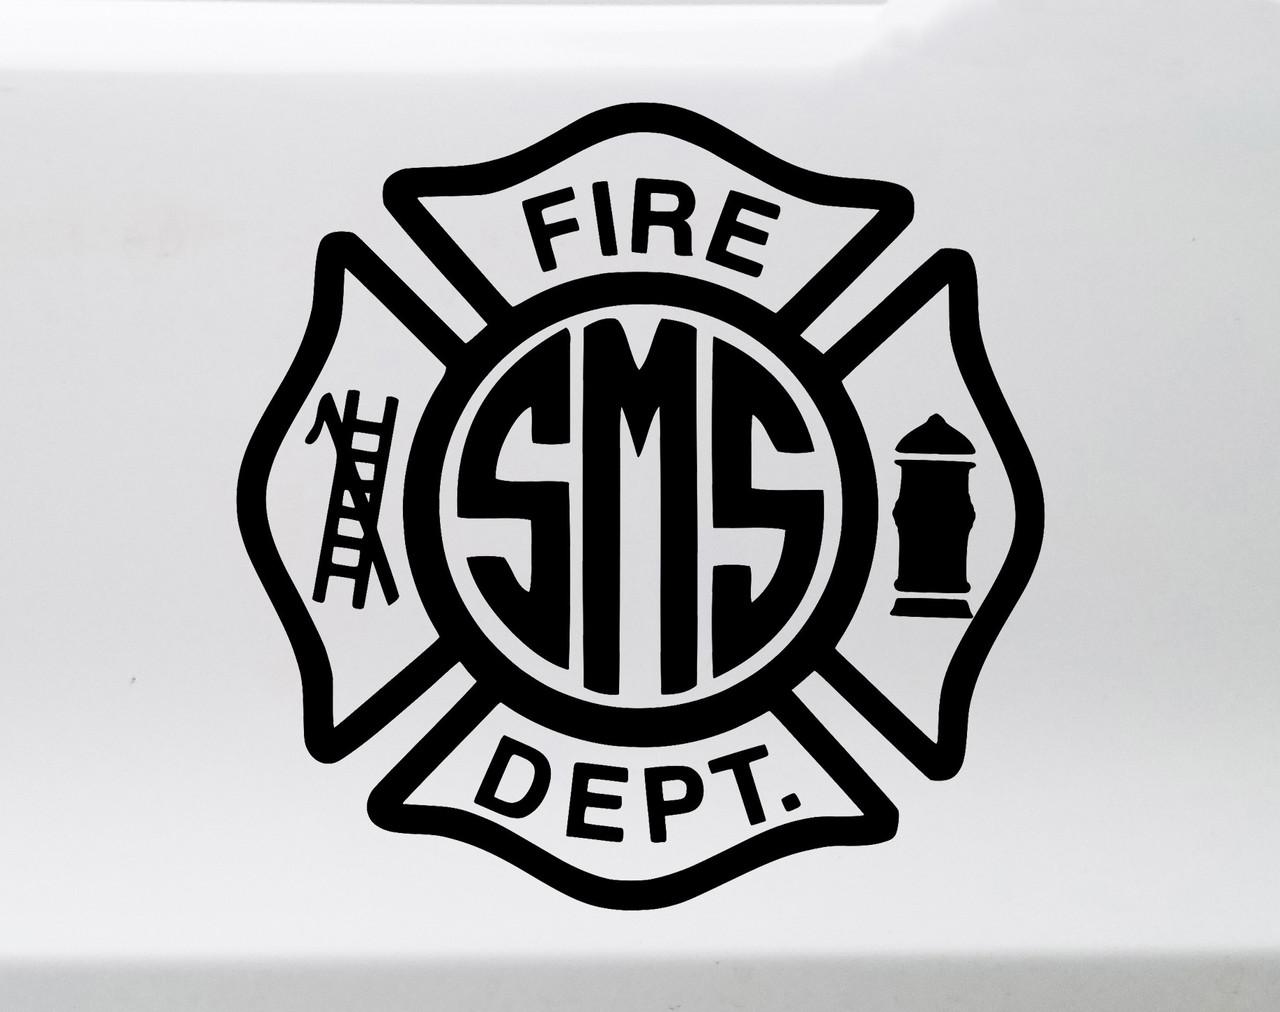 Fire Department Monogram Vinyl Decal - Maltese Cross Personalized - Die Cut Sticker